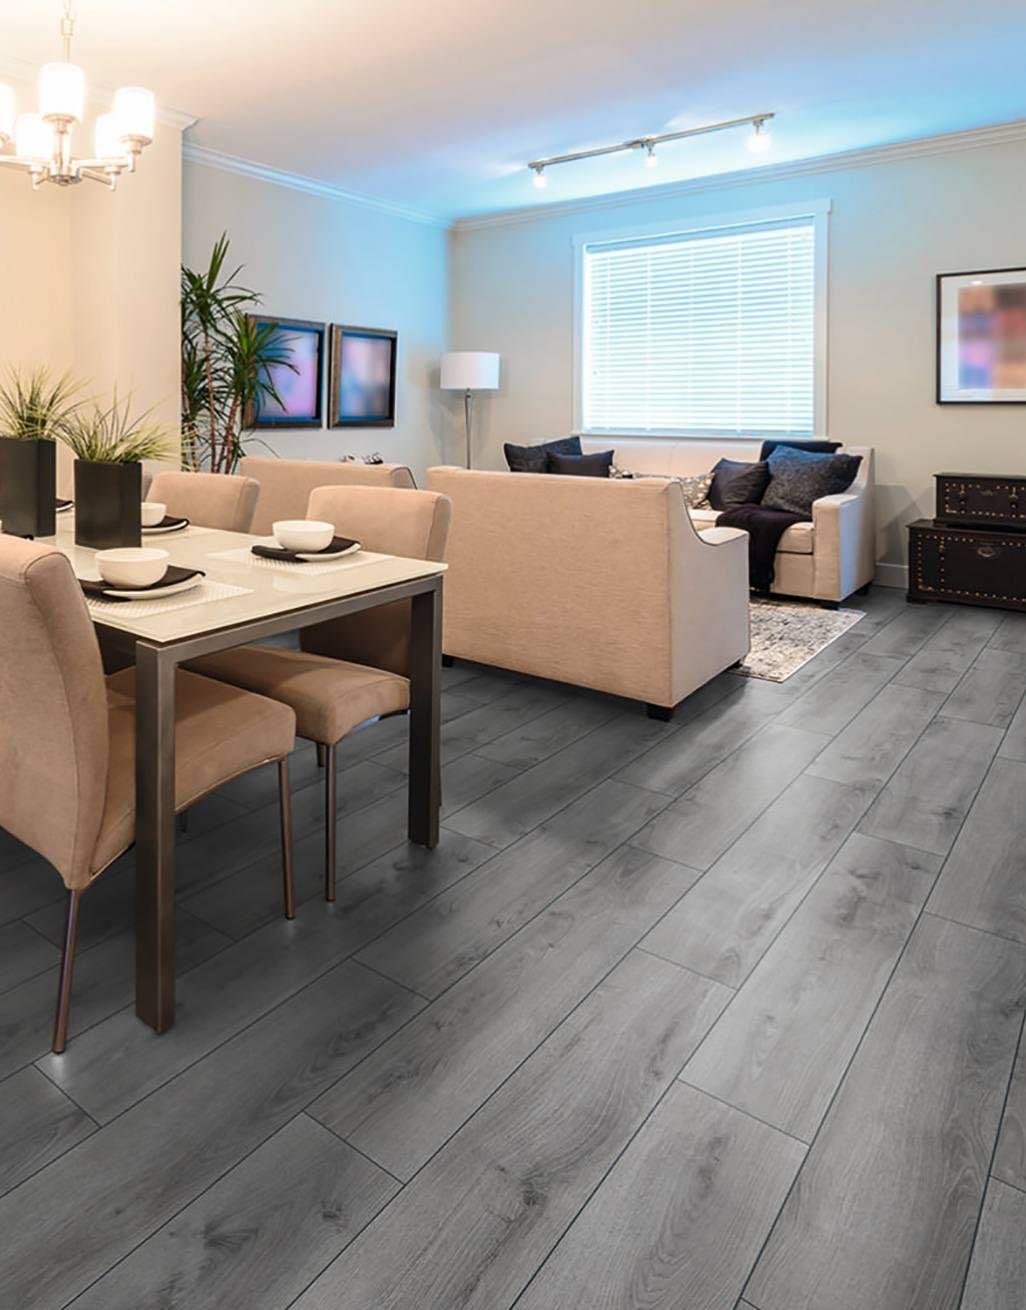 Rhino Oak Laminate Flooring, Who Makes Rhino Laminate Flooring